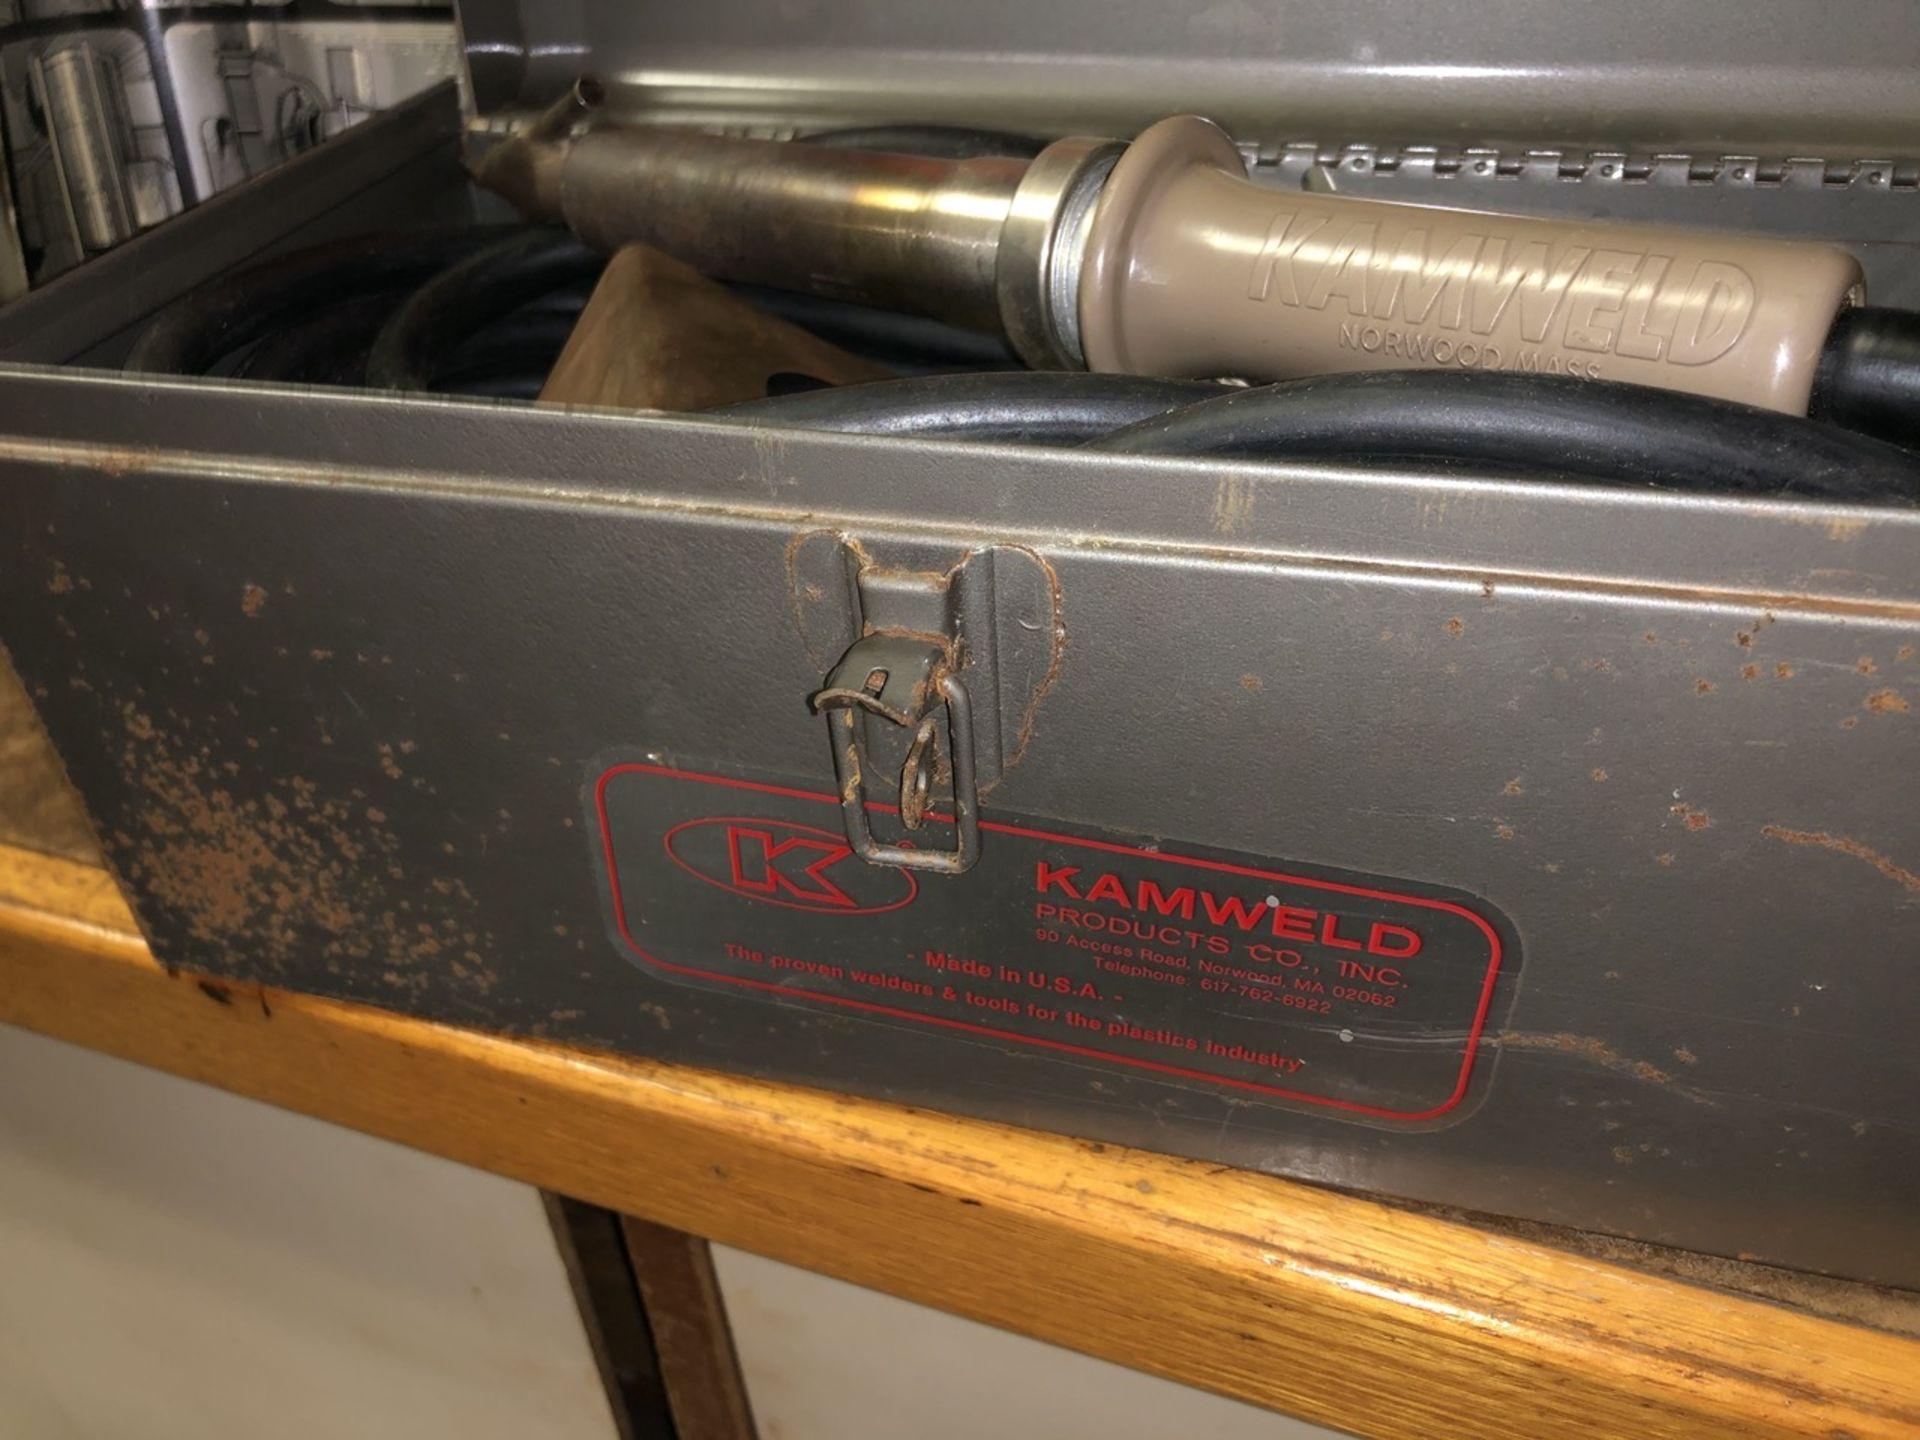 Lot 35 - Kamweld Plastic Welder with Case